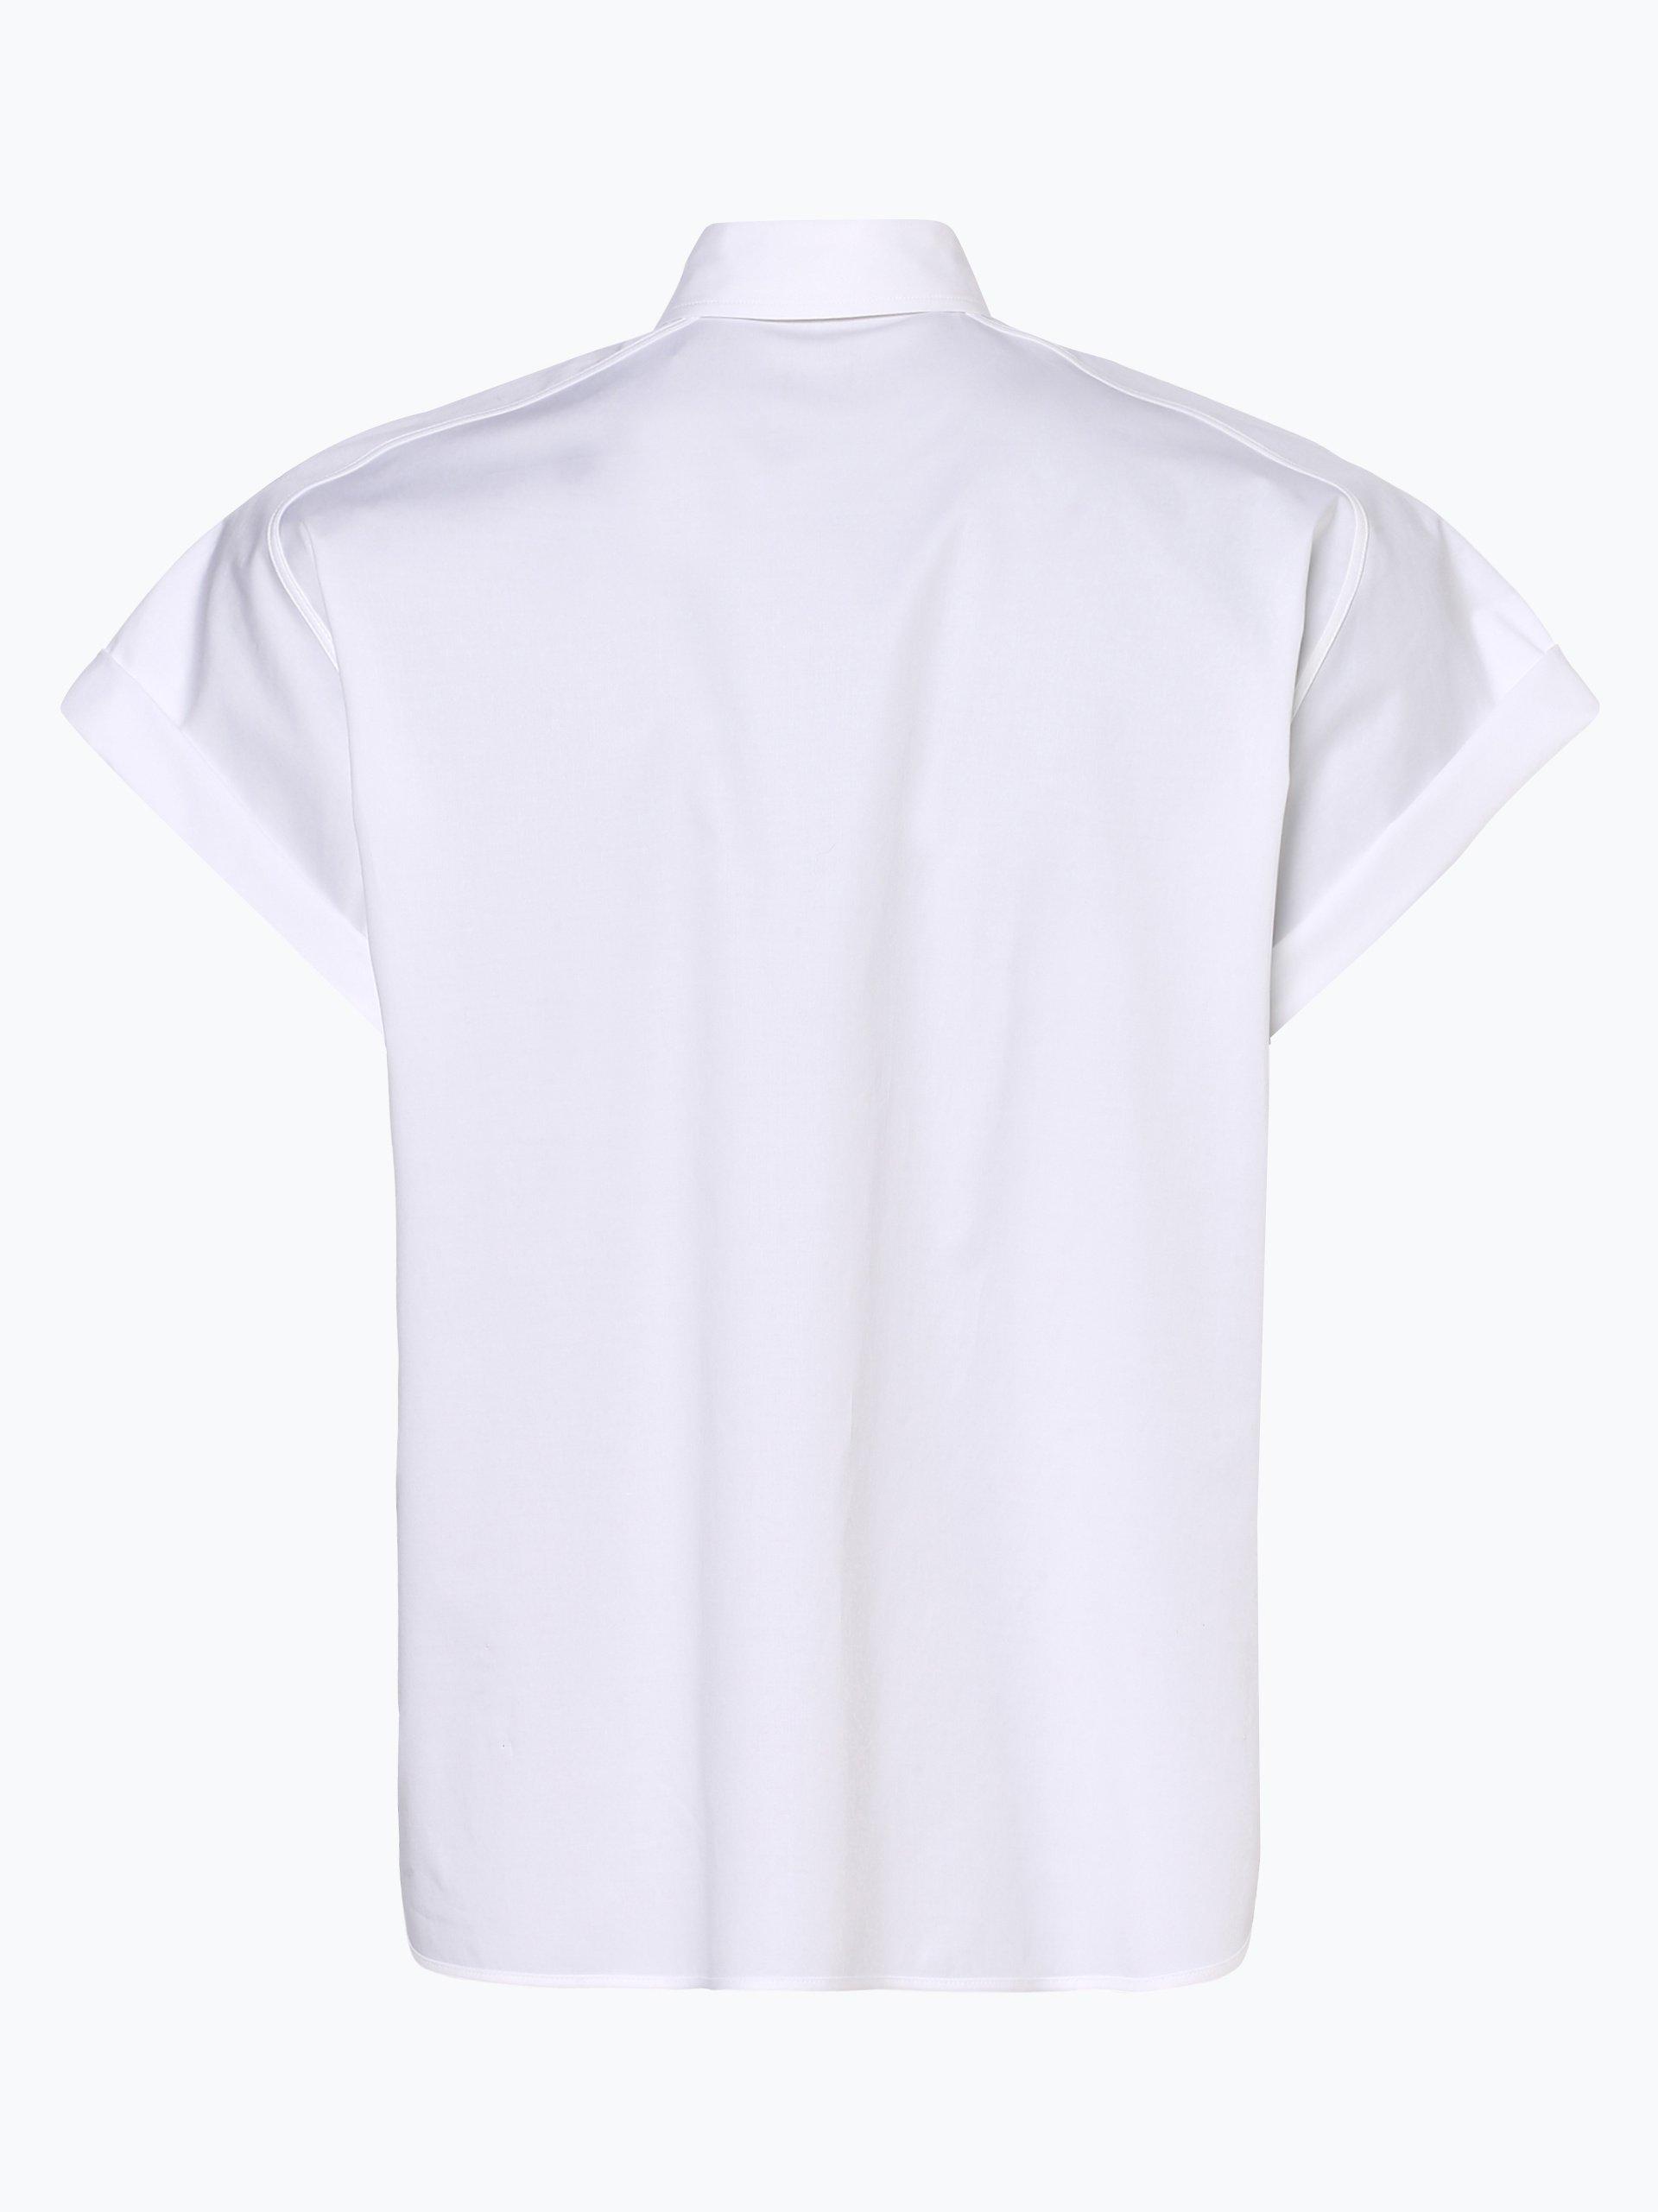 BOSS Damen Bluse - Bixina